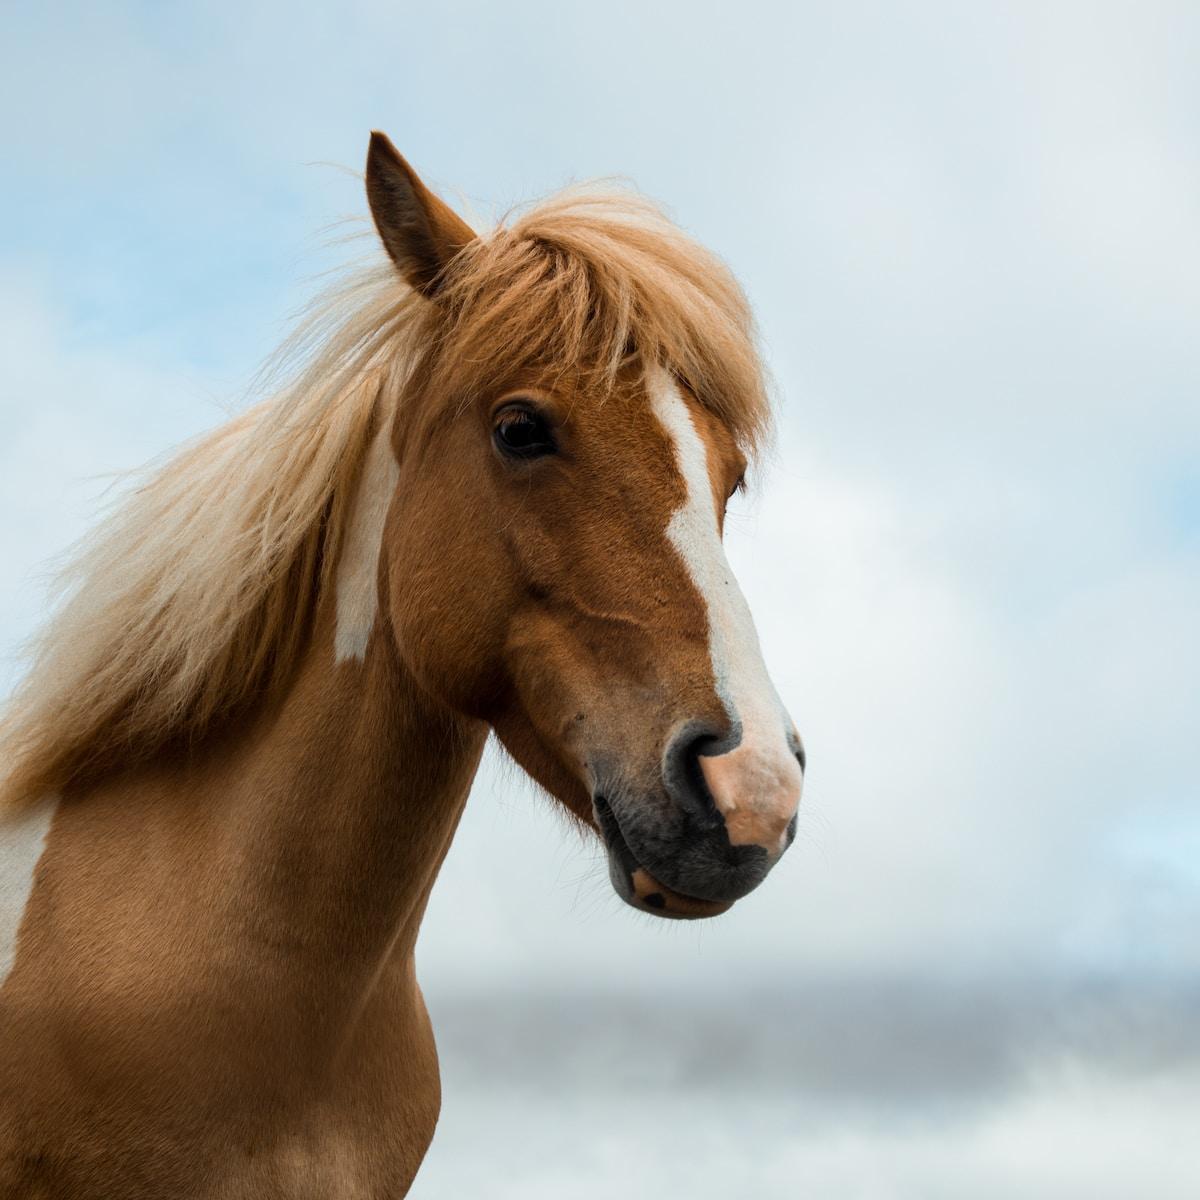 tratamiento contra el coronavirus. brown and white horse